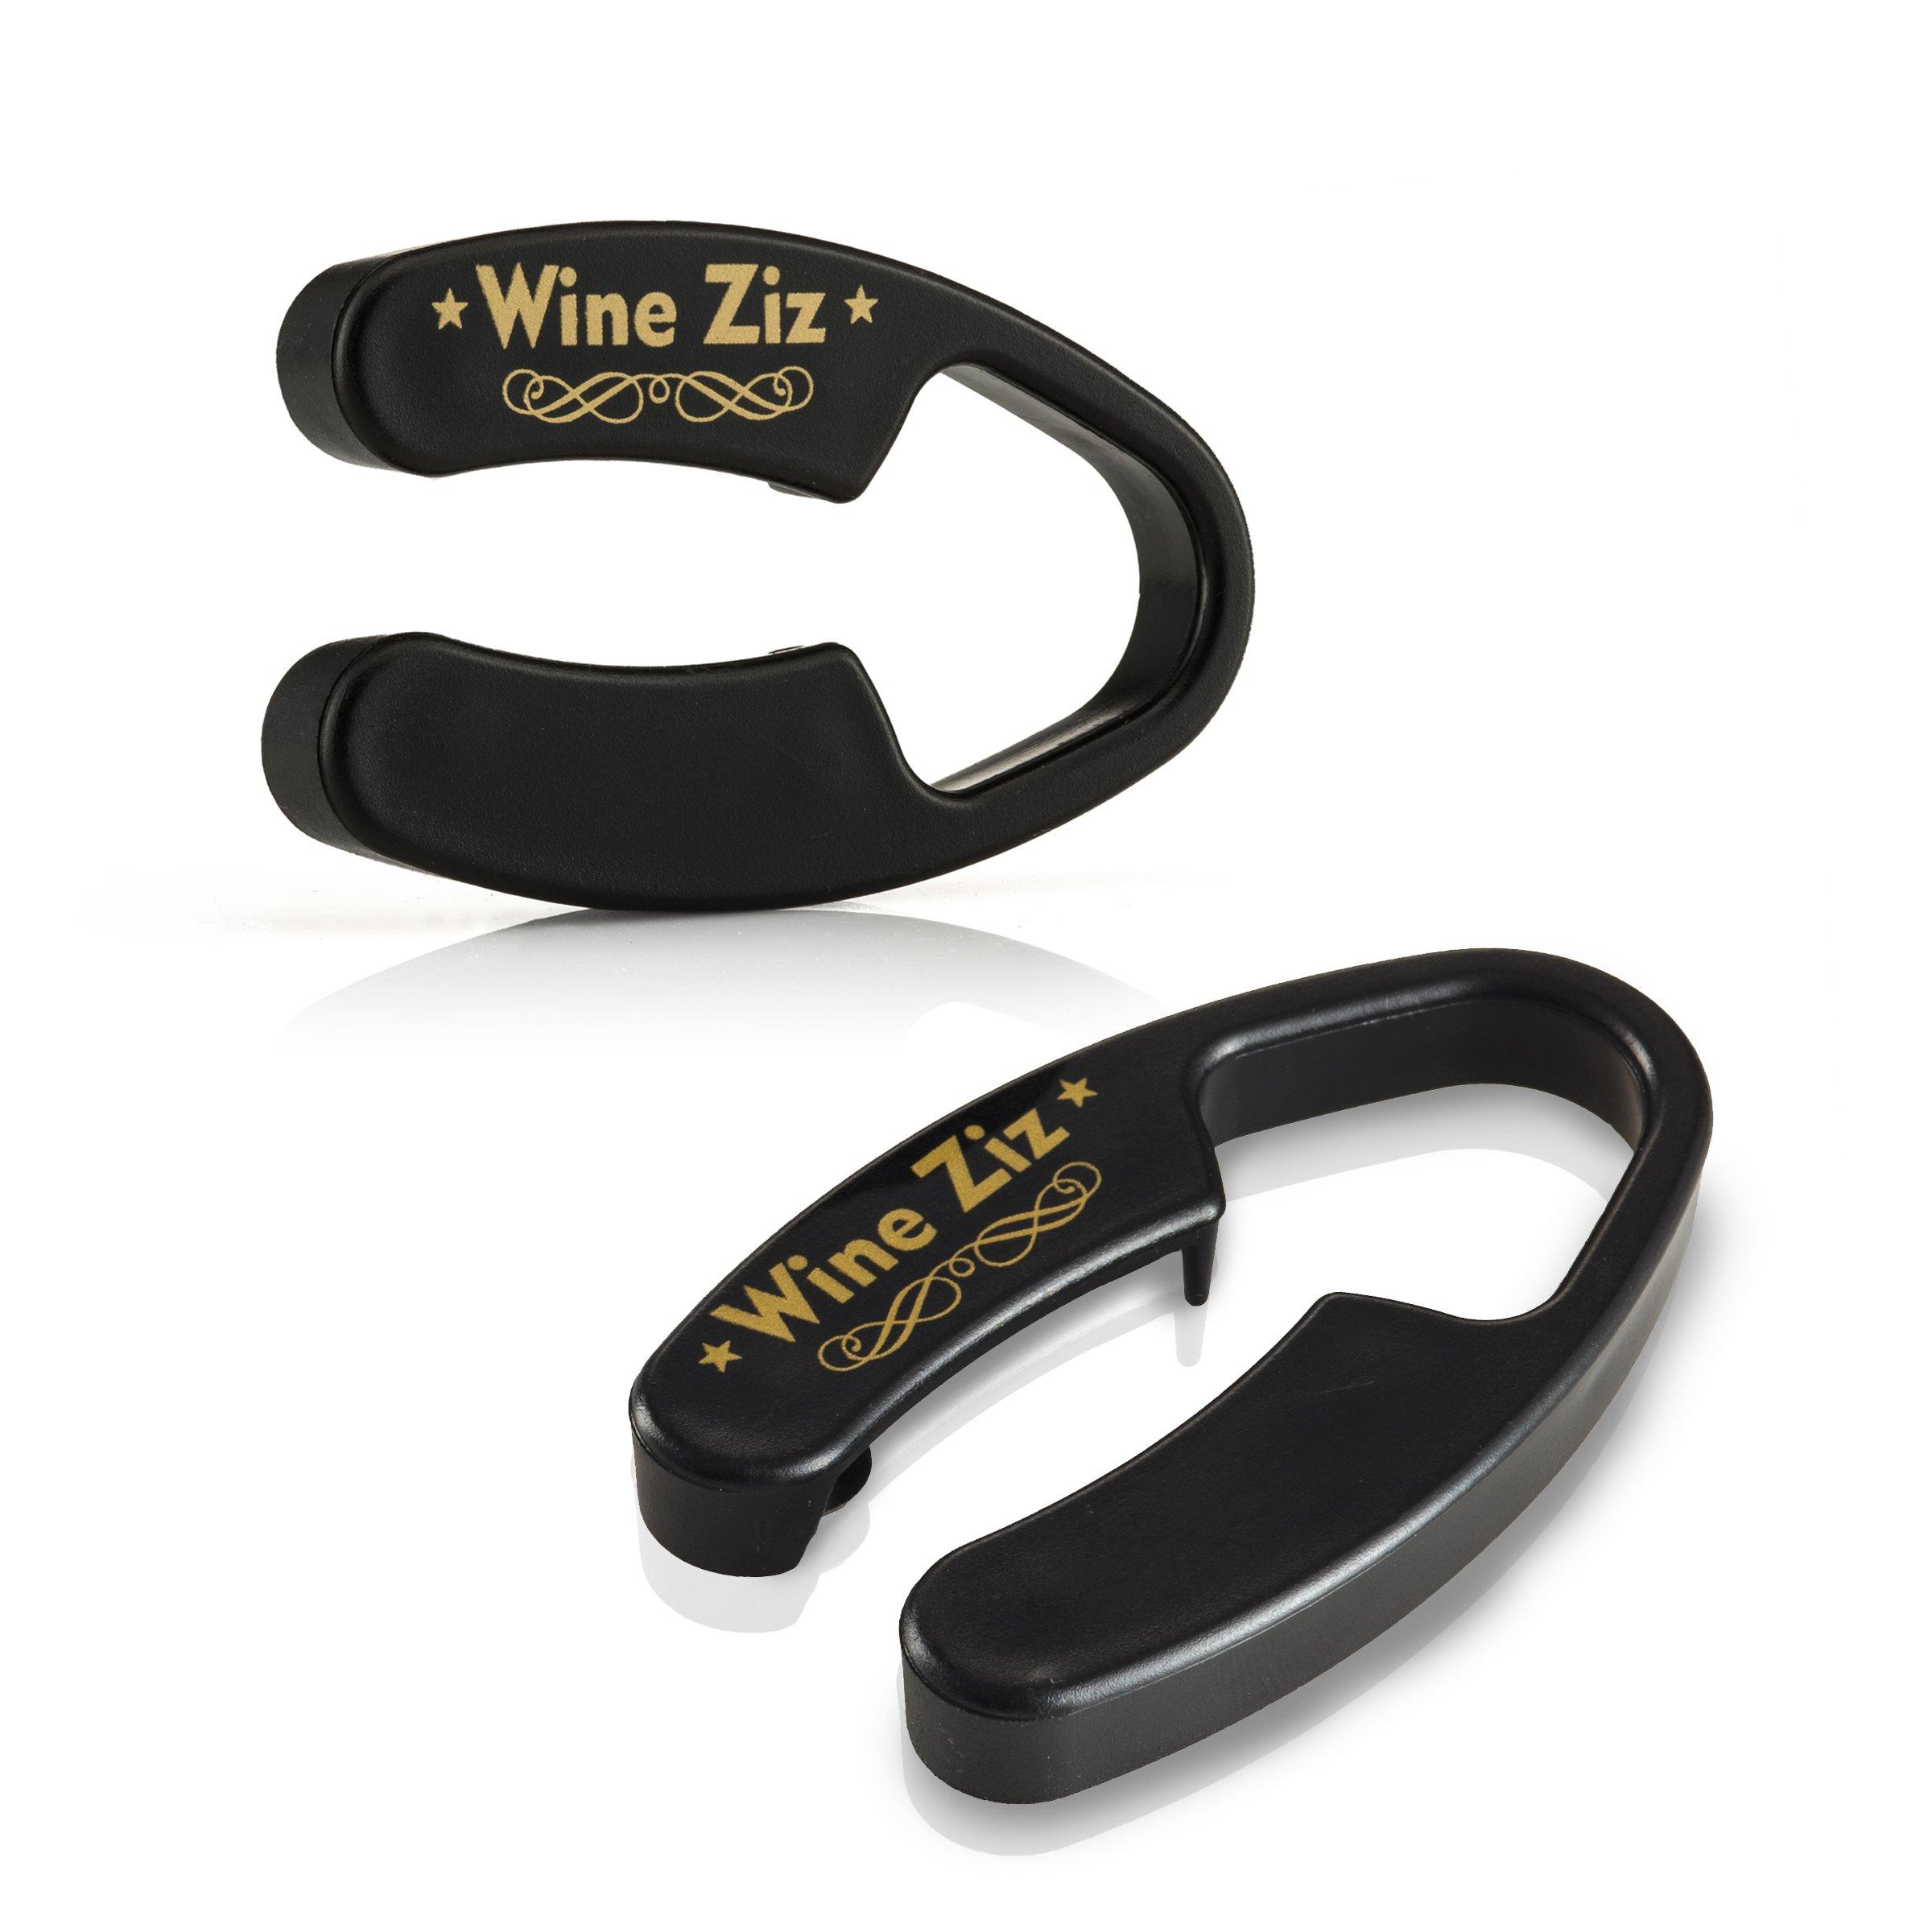 2 Pack 4 Blade Wine Bottle Top Foil Cutter Remover Opener Bar Tool NEW US Seller